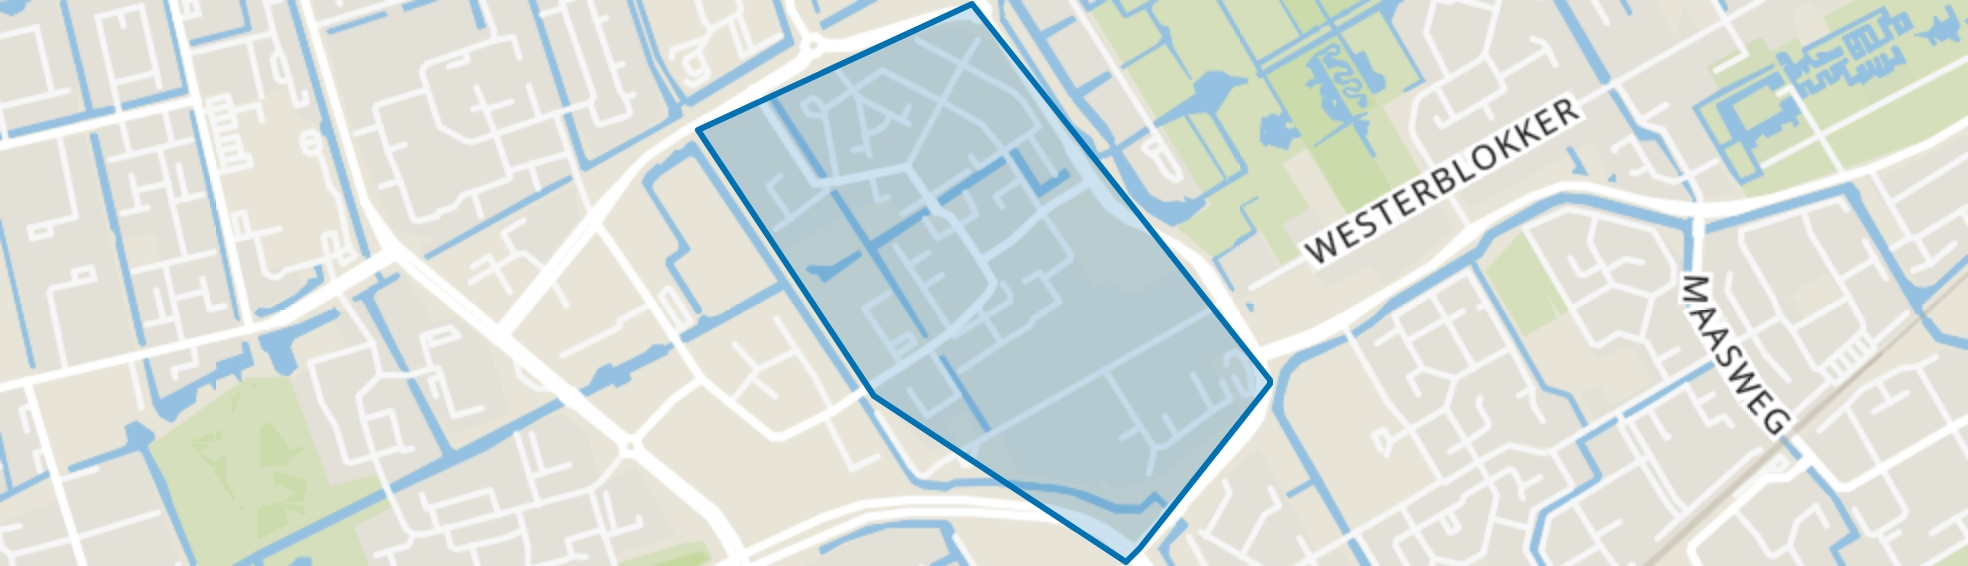 Nieuwe Steen - Buurt 22 00, Hoorn (NH) map